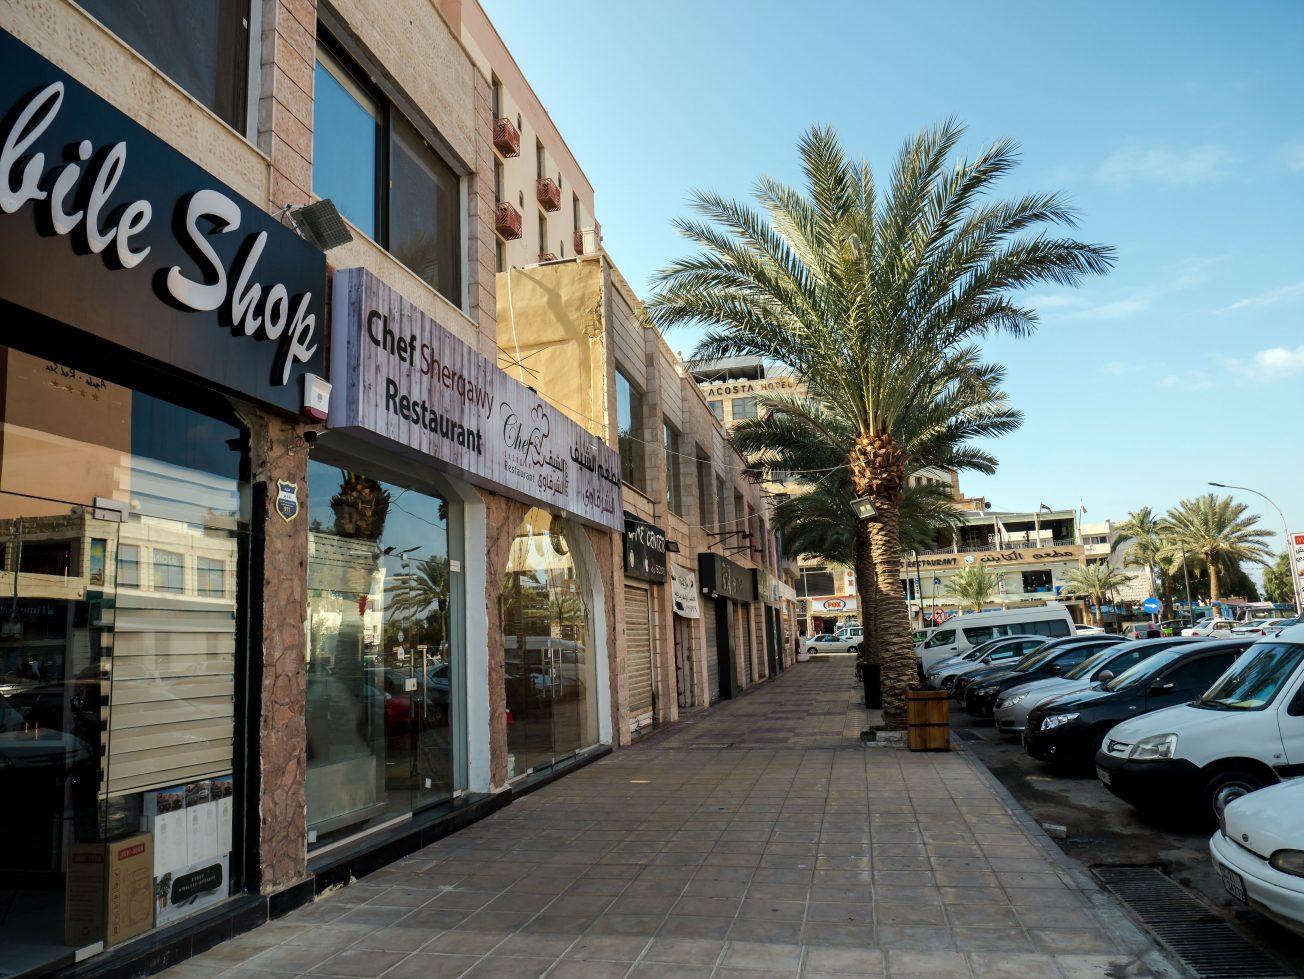 Ulica v Jordánsku